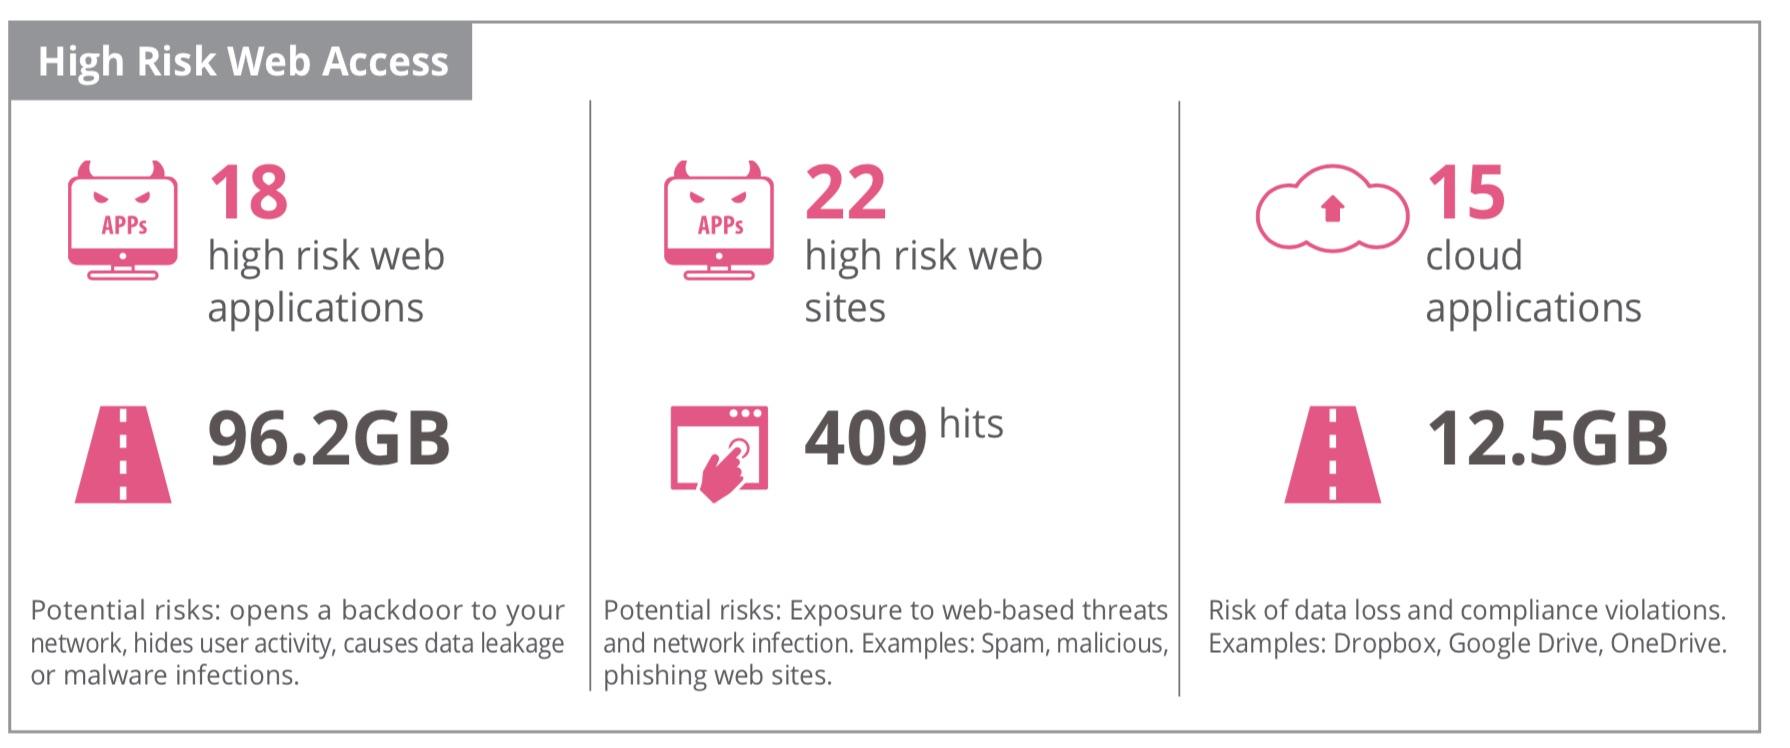 high-risk-web-access.jpg